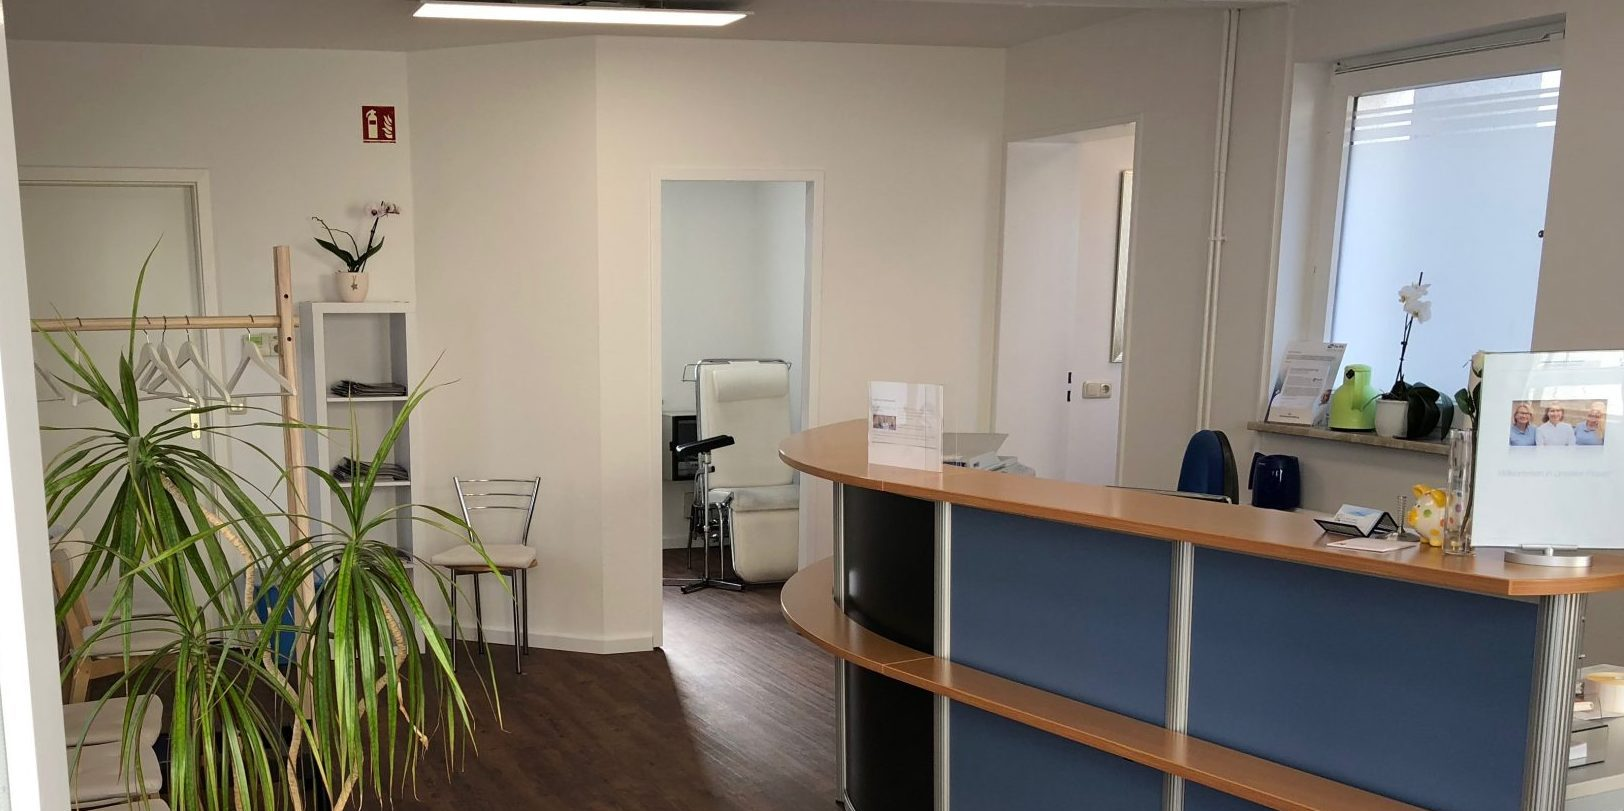 Hausarztpraxis imInnenhof